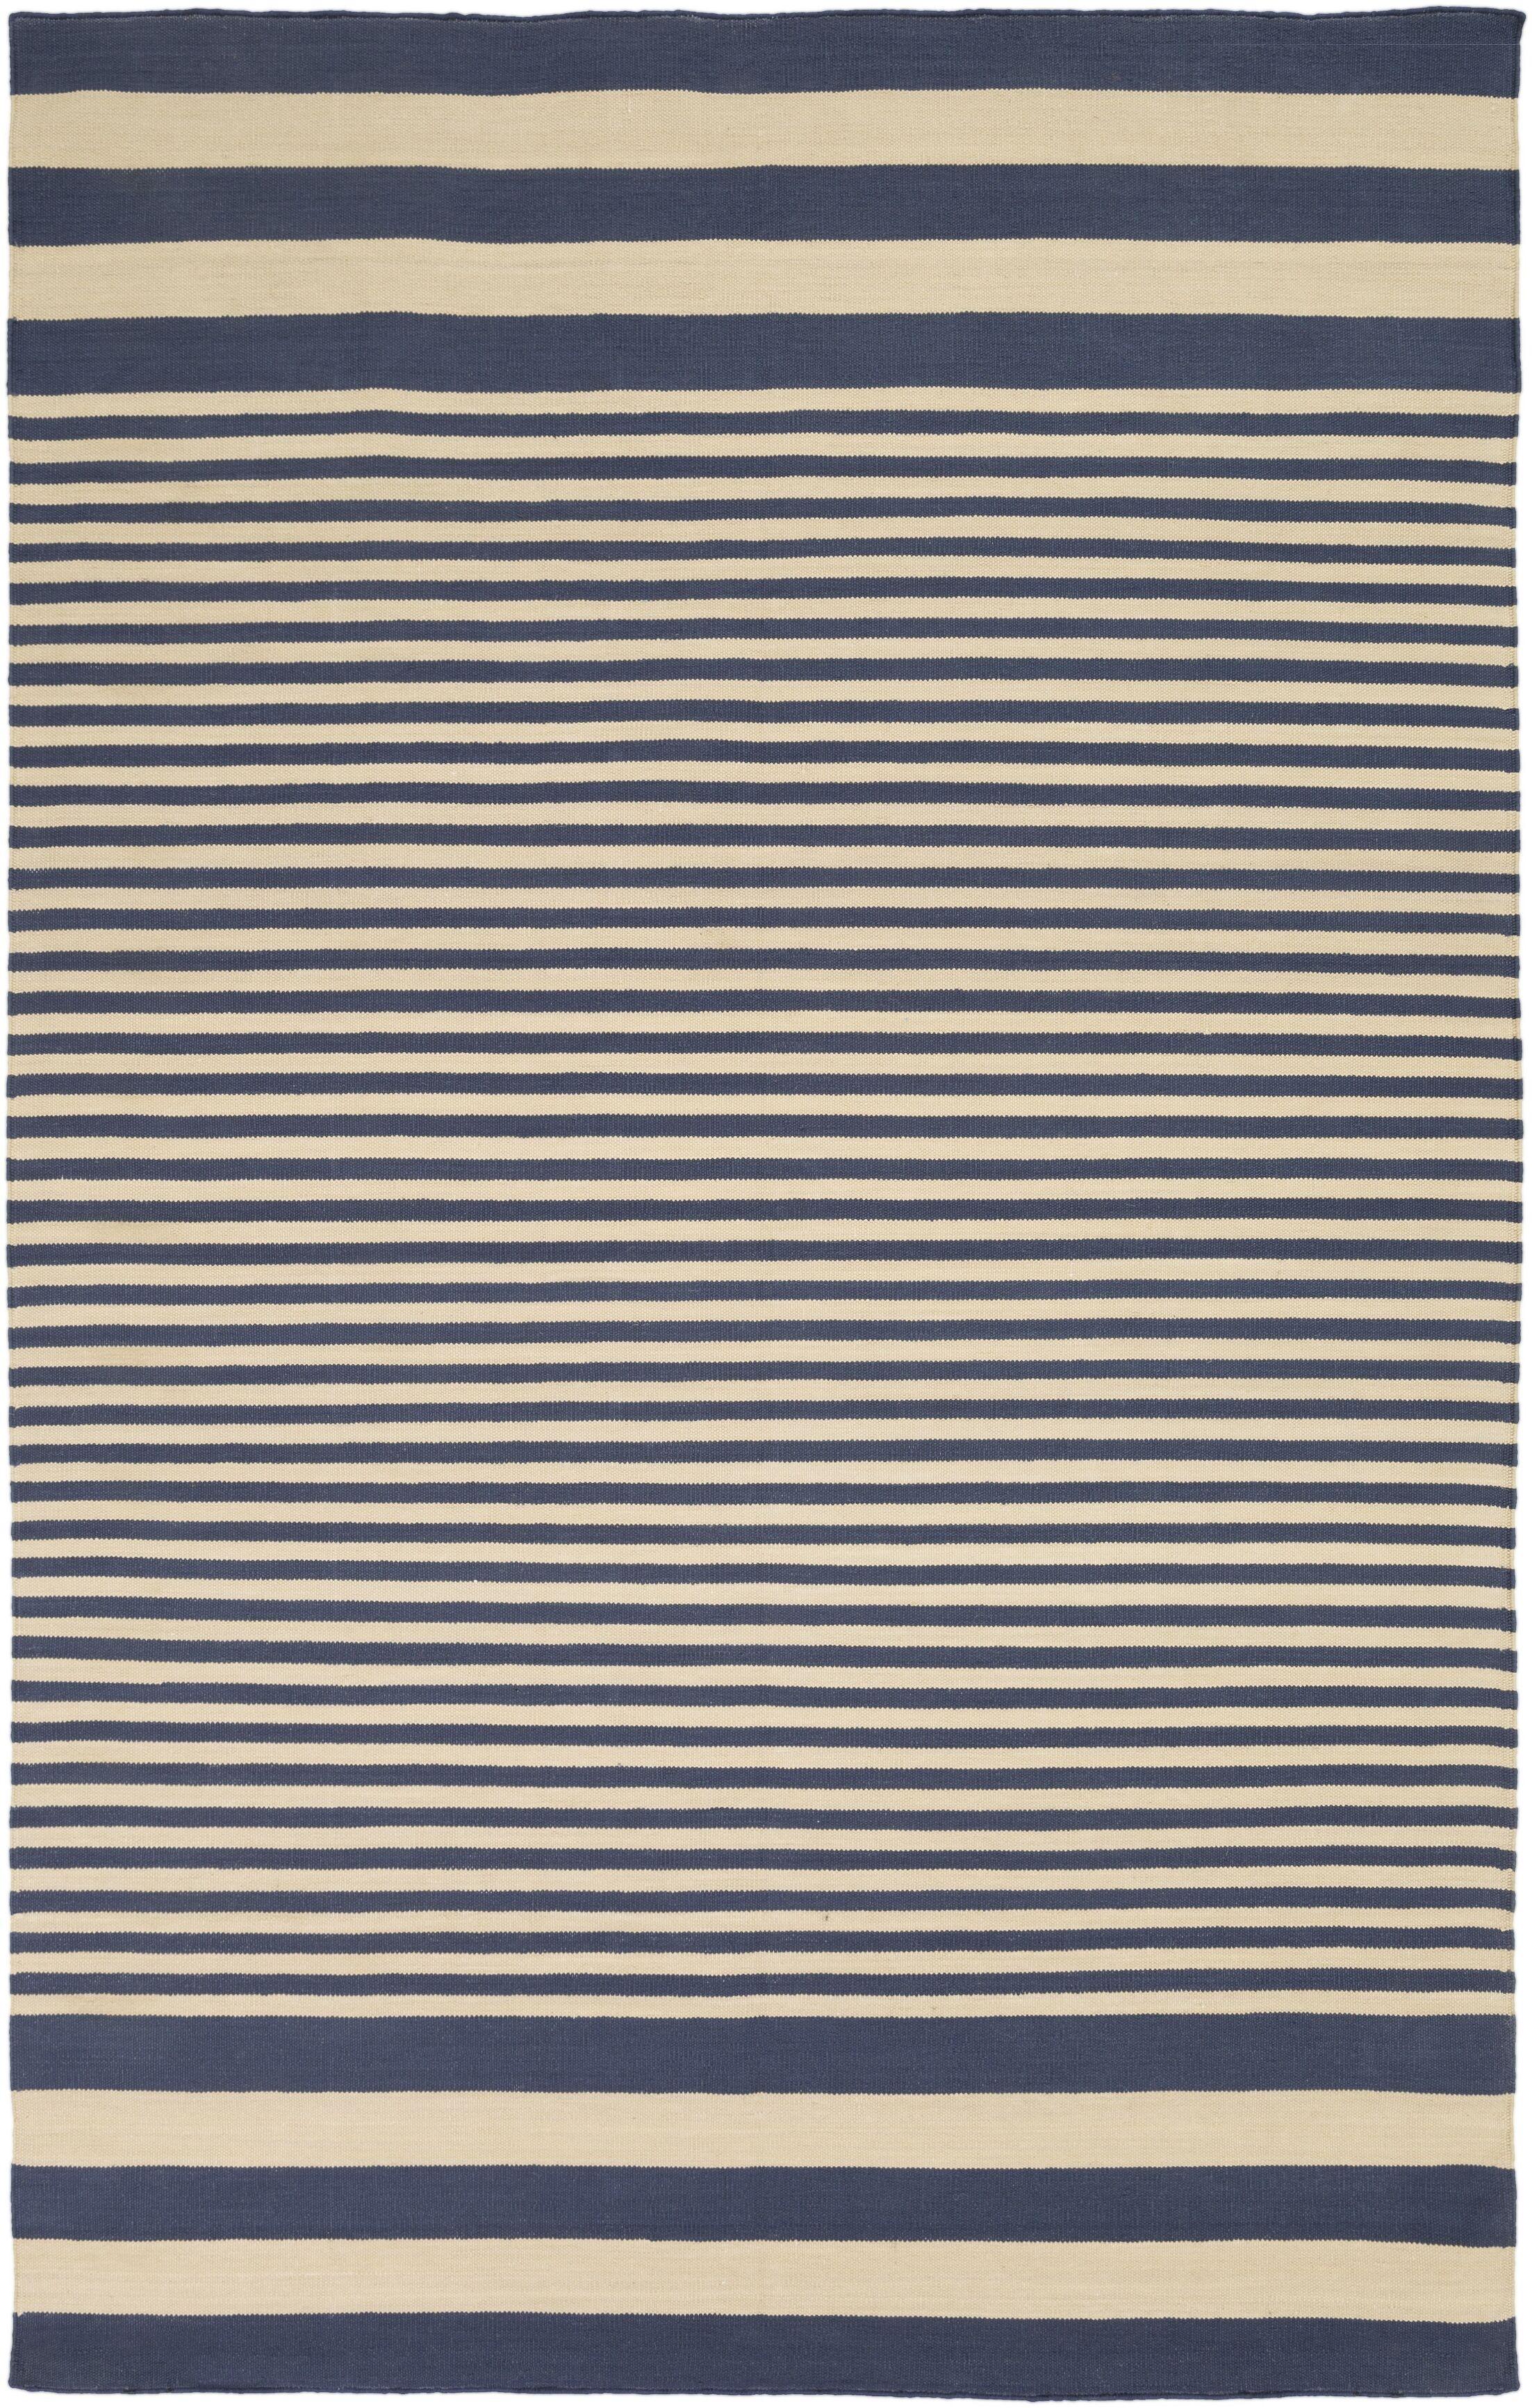 Kinslee Beige/Navy Stripe Area Rug Rug Size: Rectangle 8' x 11'